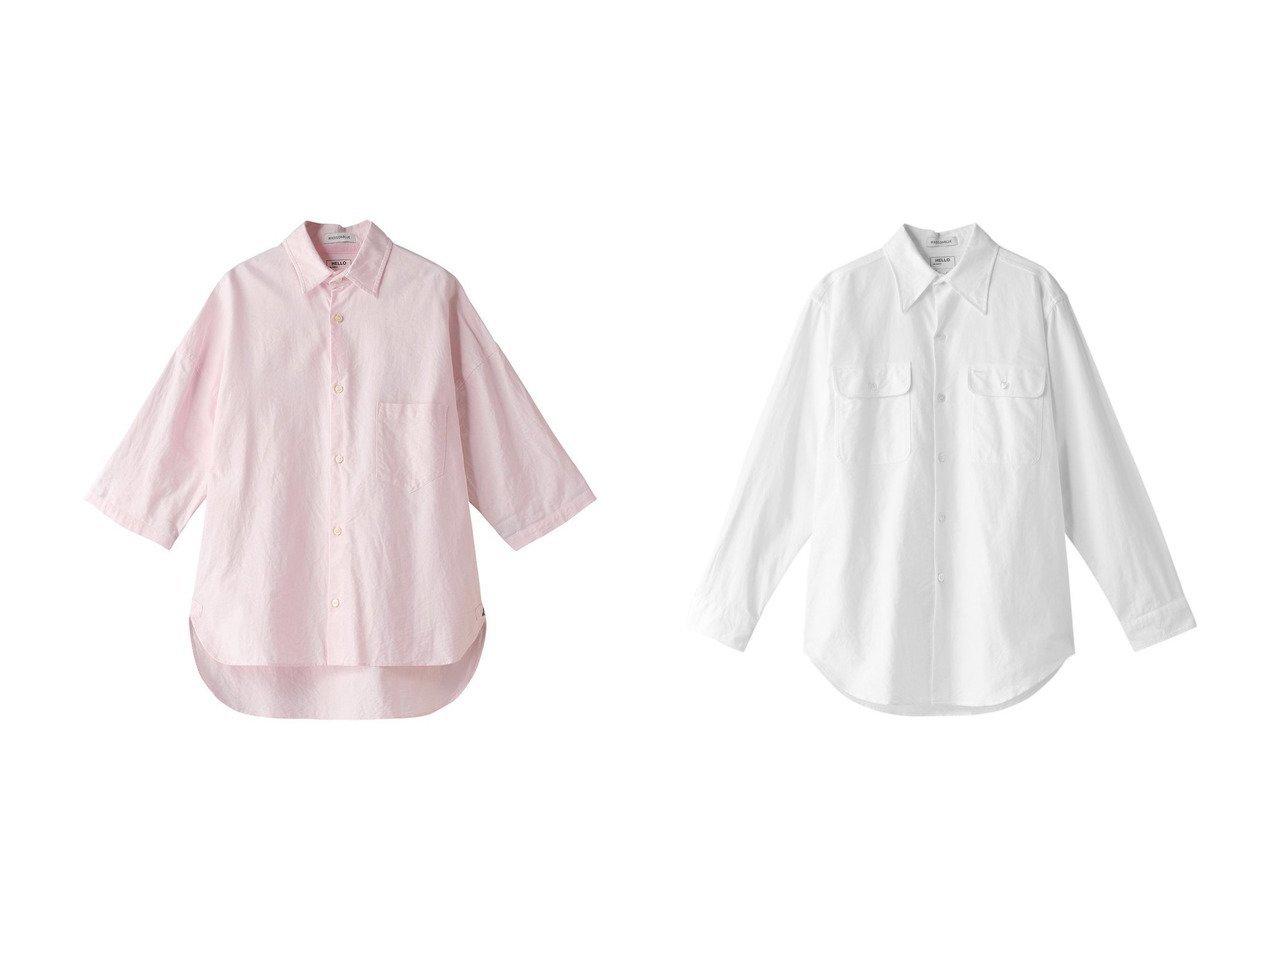 【MADISONBLUE/マディソンブルー】のJ.BRADLEY コットンオックスシャツ&HAMPTON コットンオックスシャツ MADISONBLUEのおすすめ!人気、トレンド・レディースファッションの通販 おすすめで人気の流行・トレンド、ファッションの通販商品 メンズファッション・キッズファッション・インテリア・家具・レディースファッション・服の通販 founy(ファニー) https://founy.com/ ファッション Fashion レディースファッション WOMEN トップス Tops Tshirt シャツ/ブラウス Shirts Blouses 2021年 2021 2021 春夏 S/S SS Spring/Summer 2021 S/S 春夏 SS Spring/Summer シンプル スリーブ ロング 春 Spring |ID:crp329100000016901